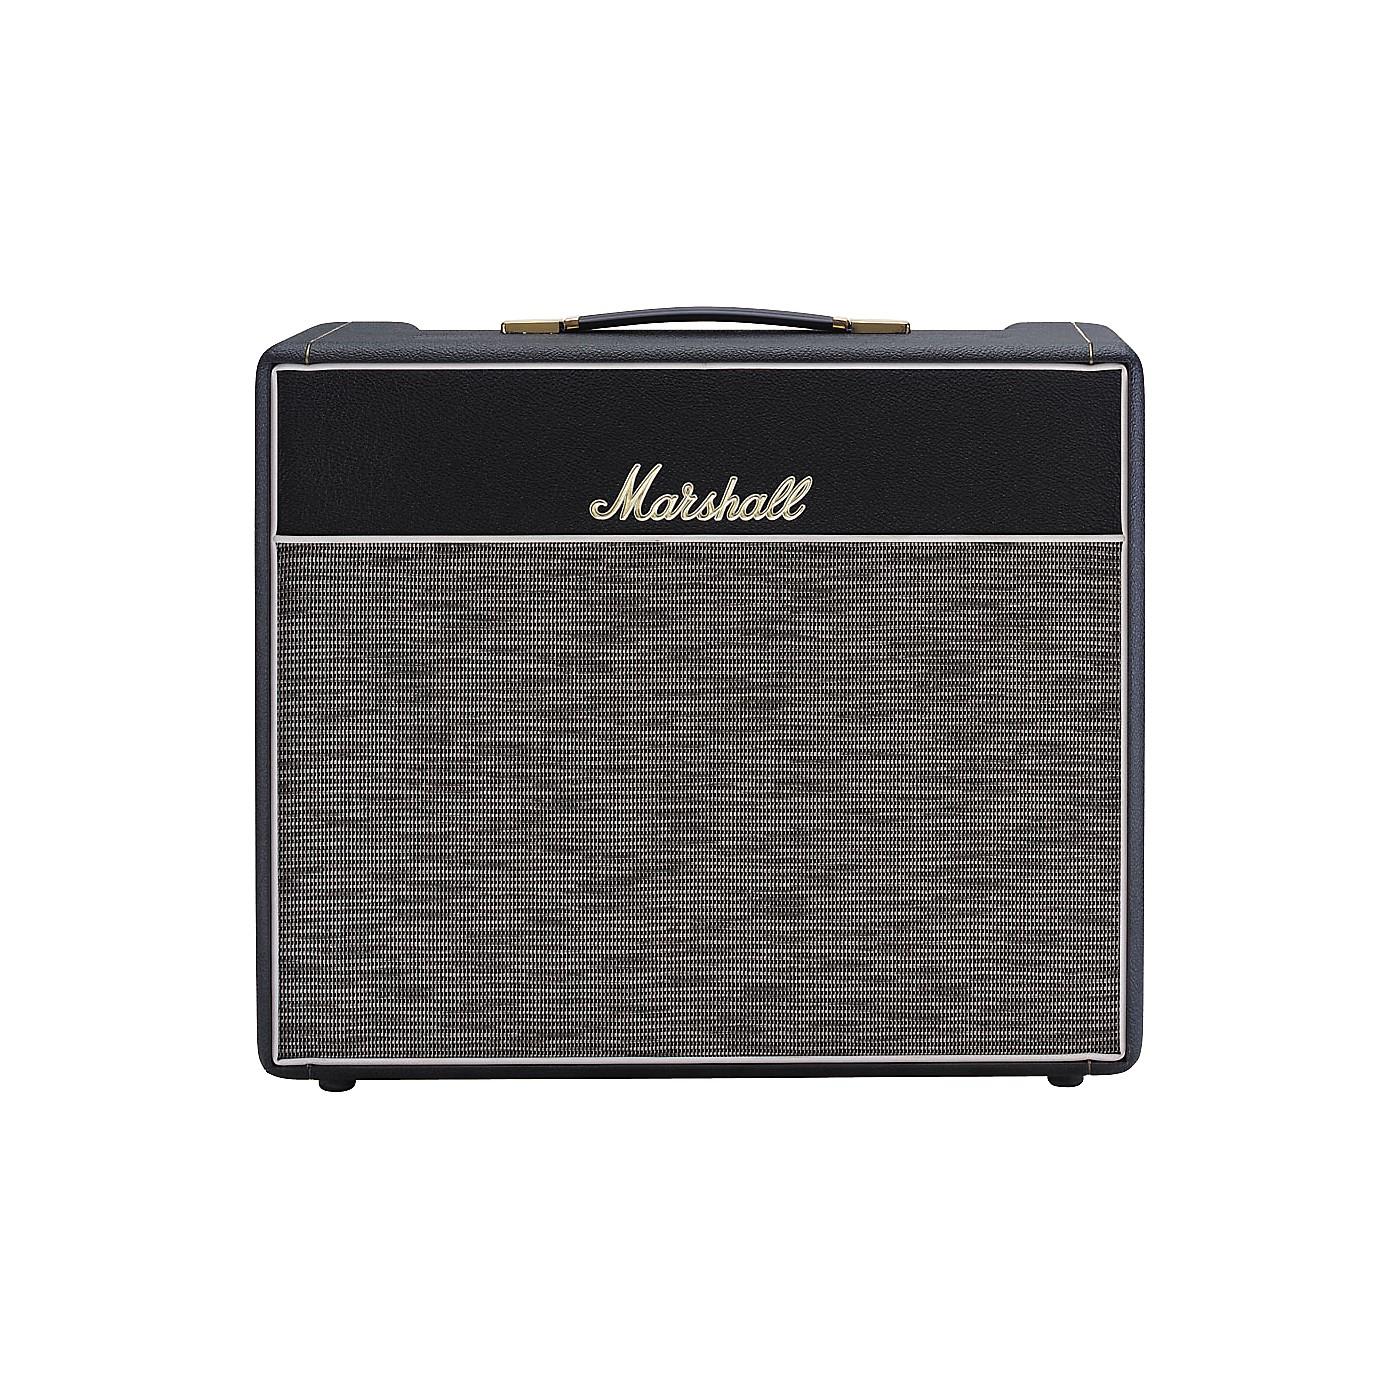 Marshall 1974X Handwired 18W 1x12 Combo Amp thumbnail